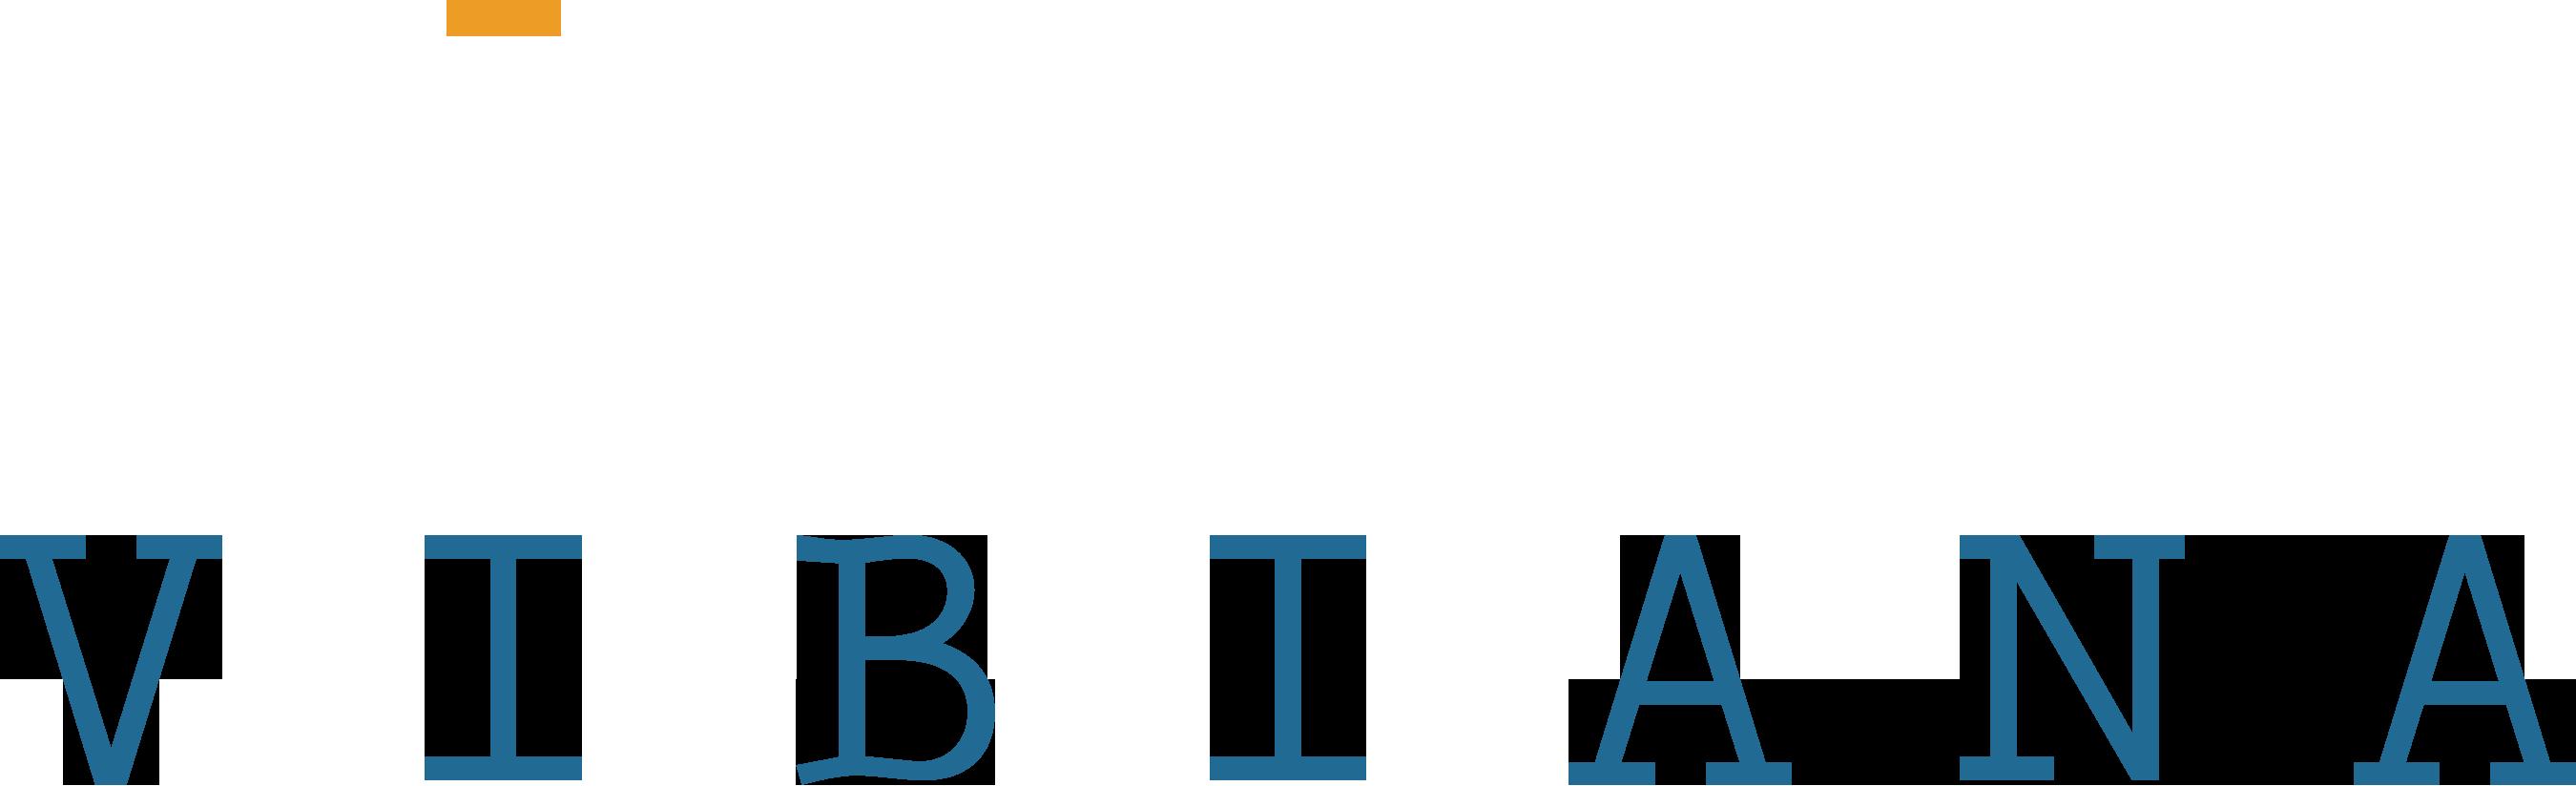 VIB_Logotype_RGB